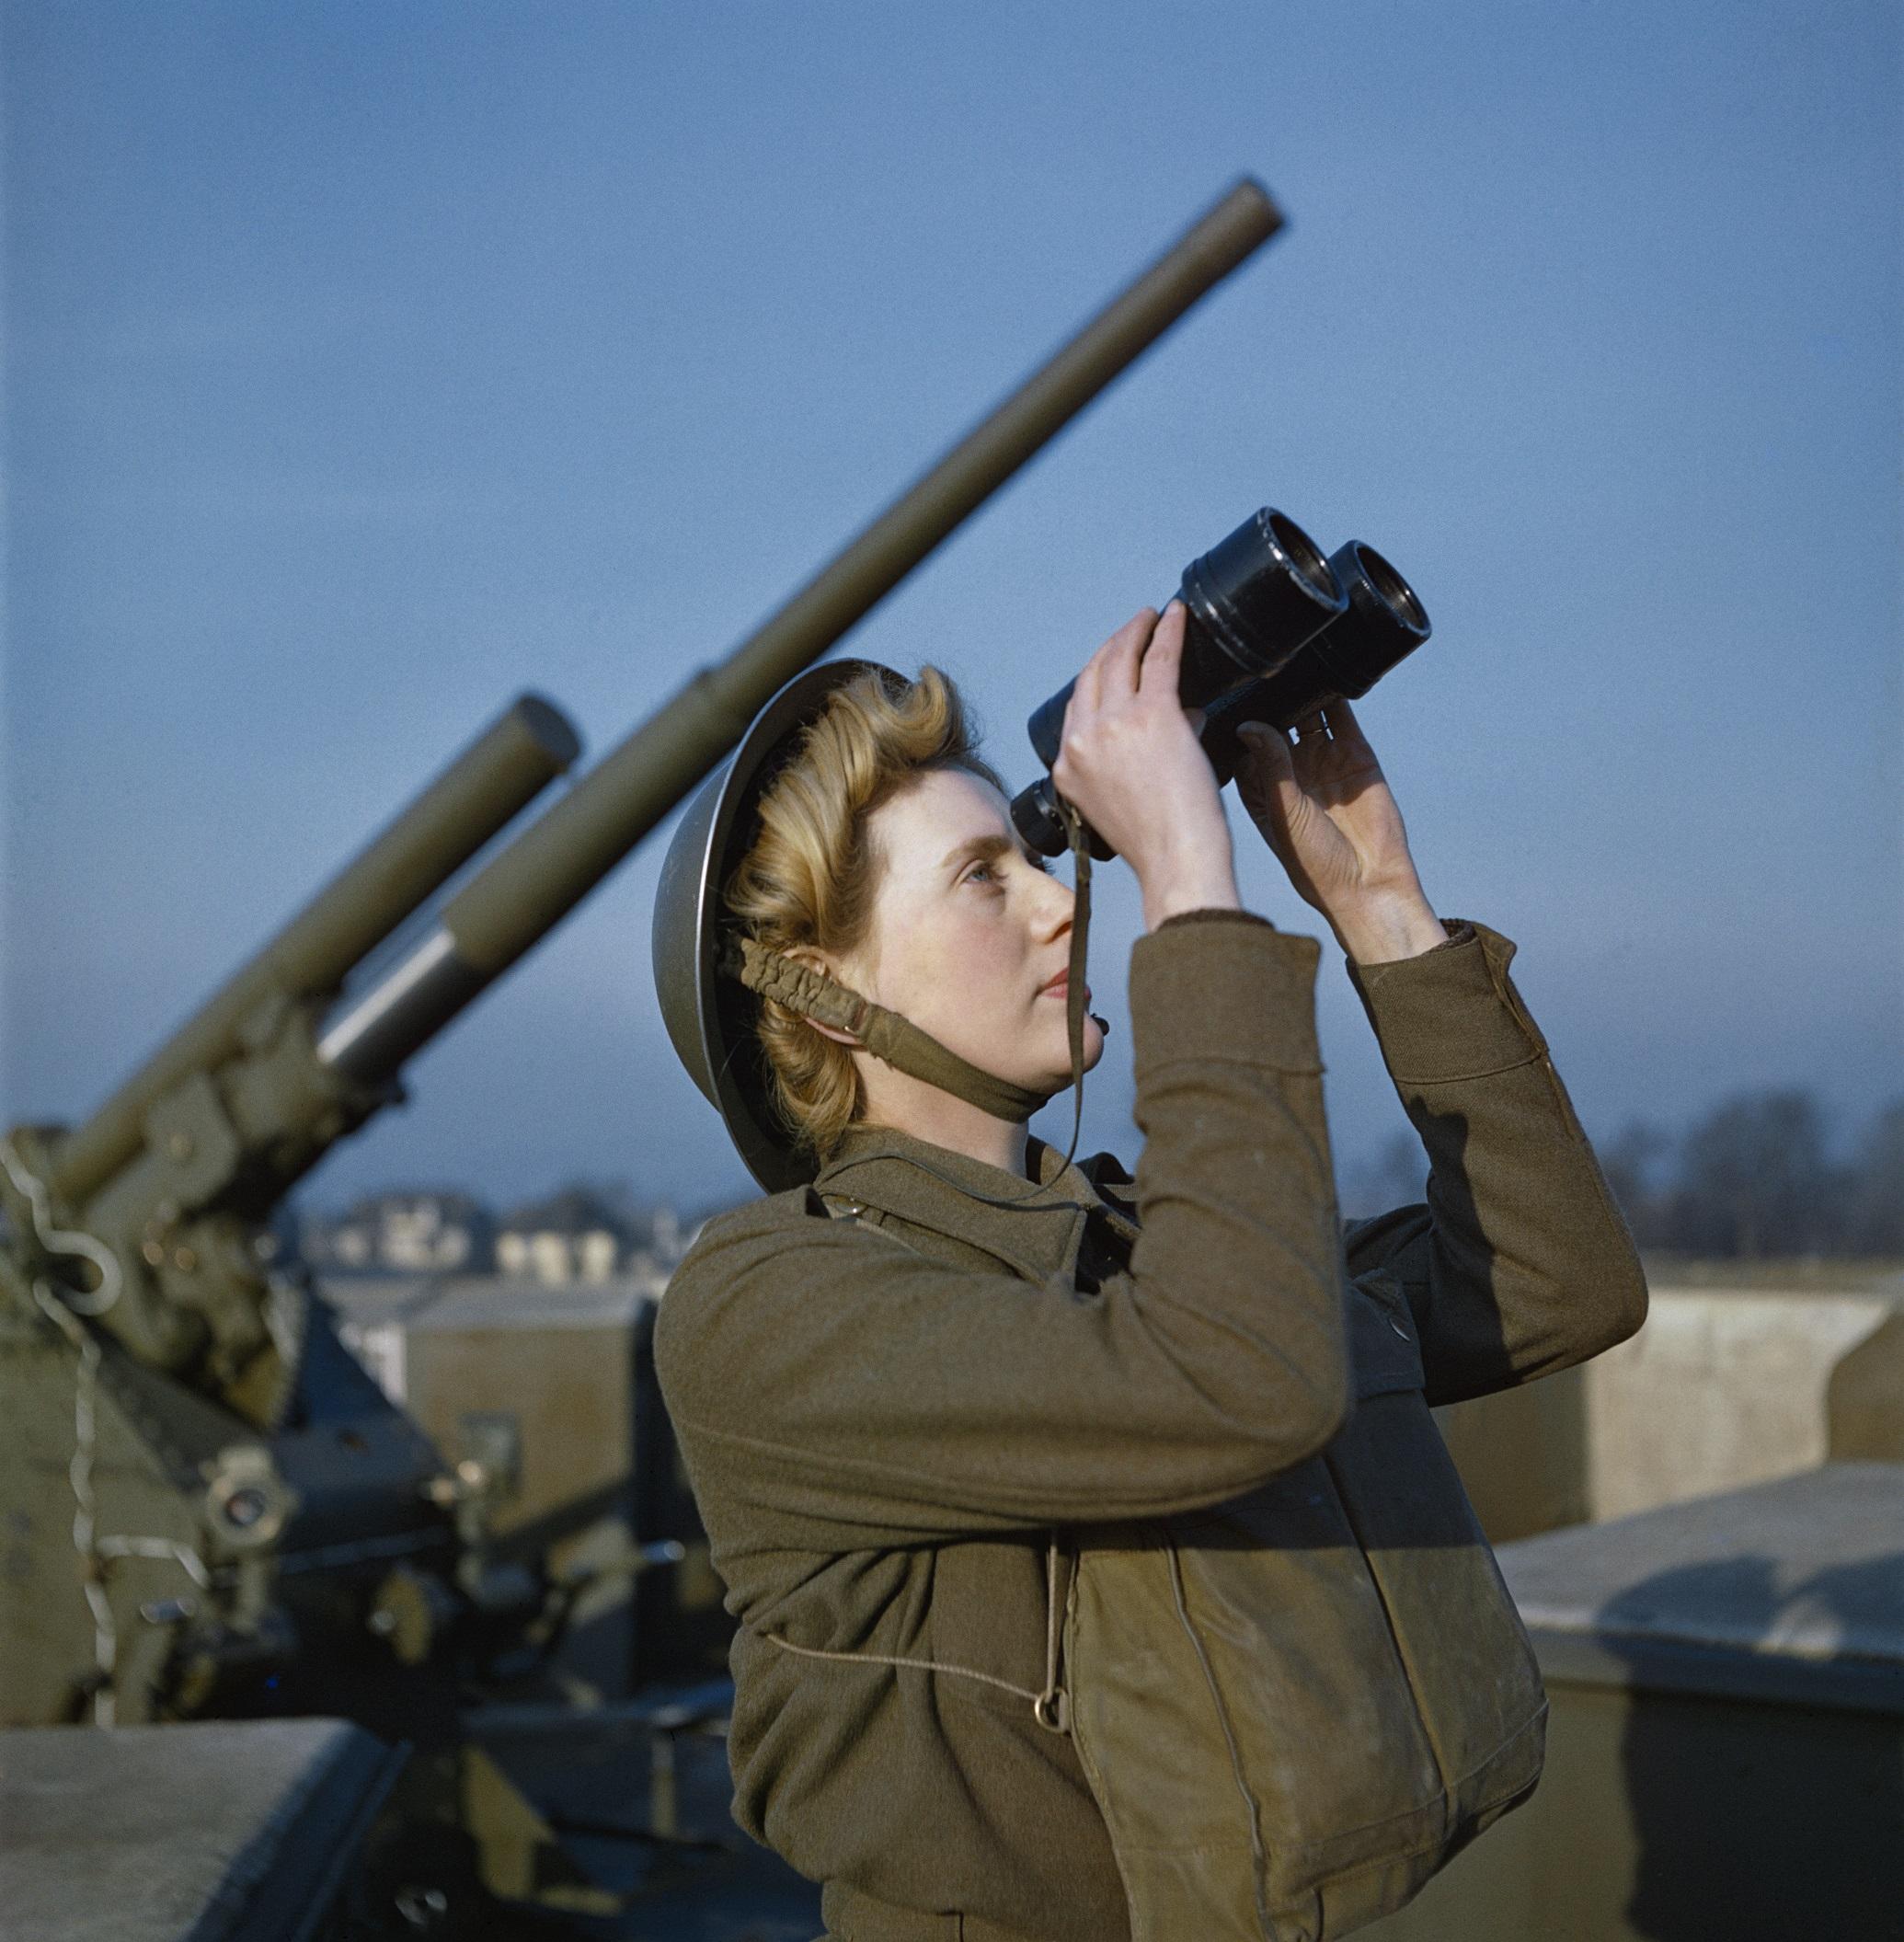 Color photos of World War II cast new light on the war - CNN Style